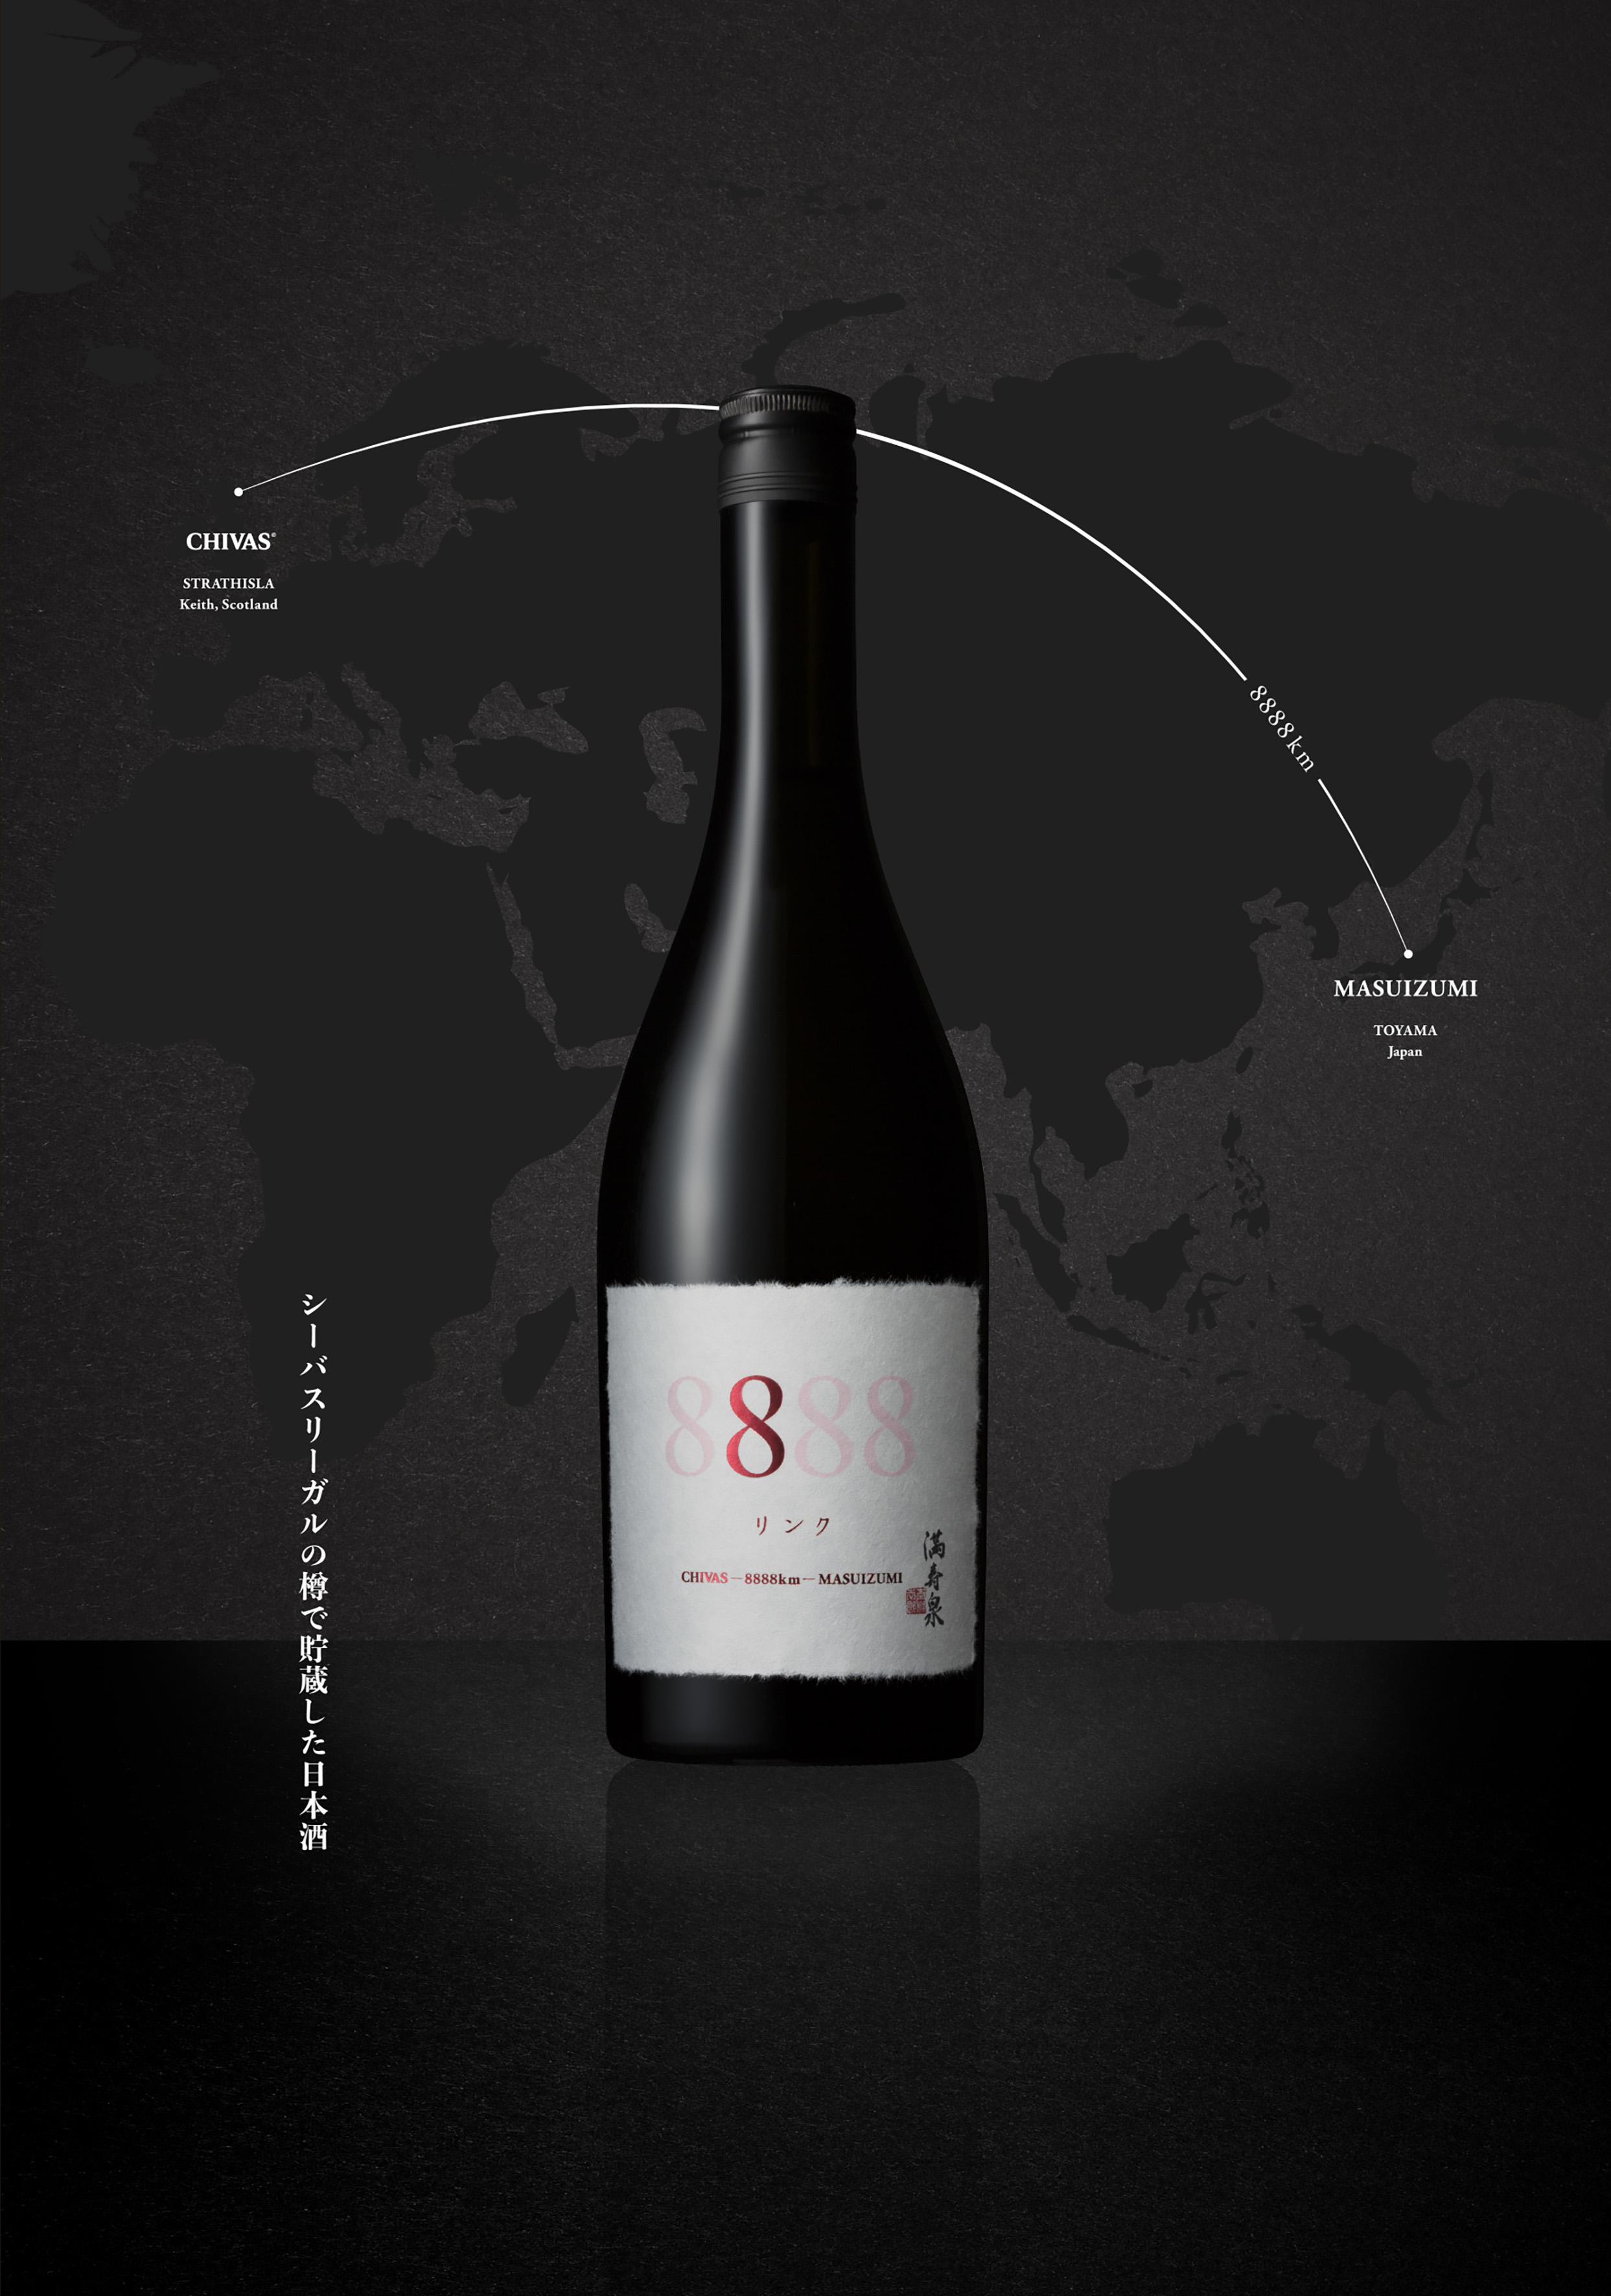 Link 8888, a sake aged in Chivas Regal casks